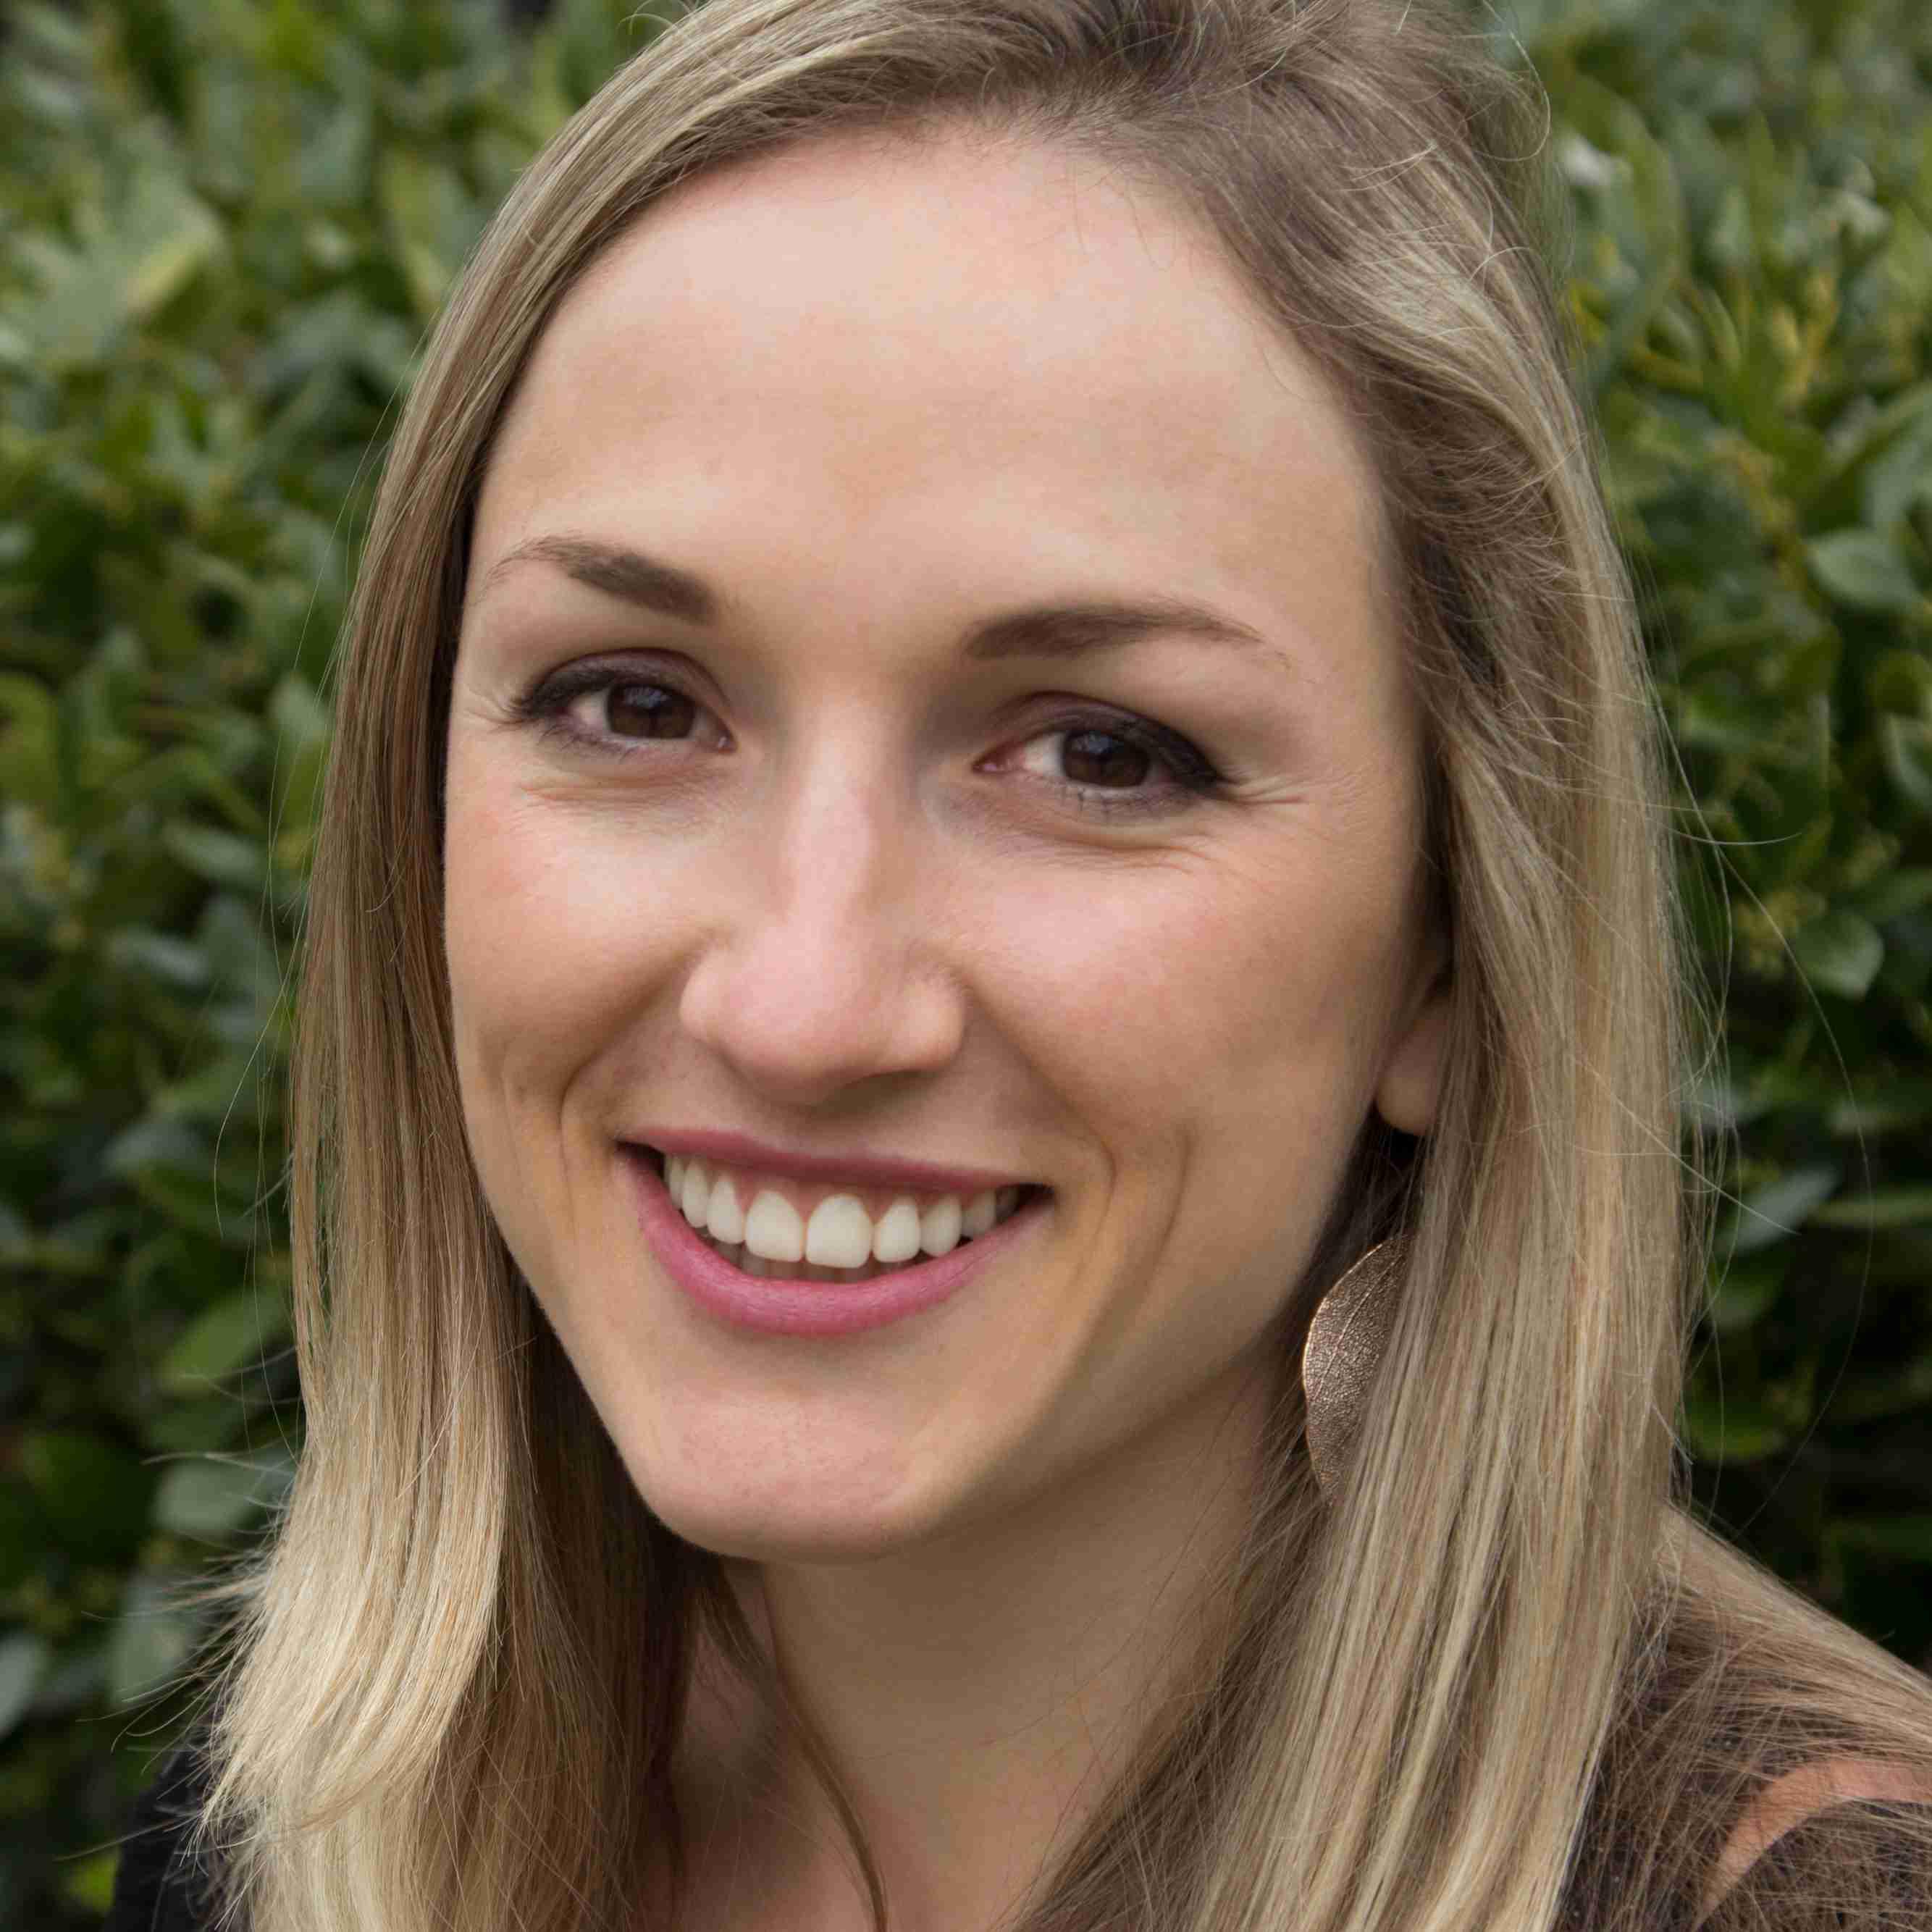 Natalie Emery